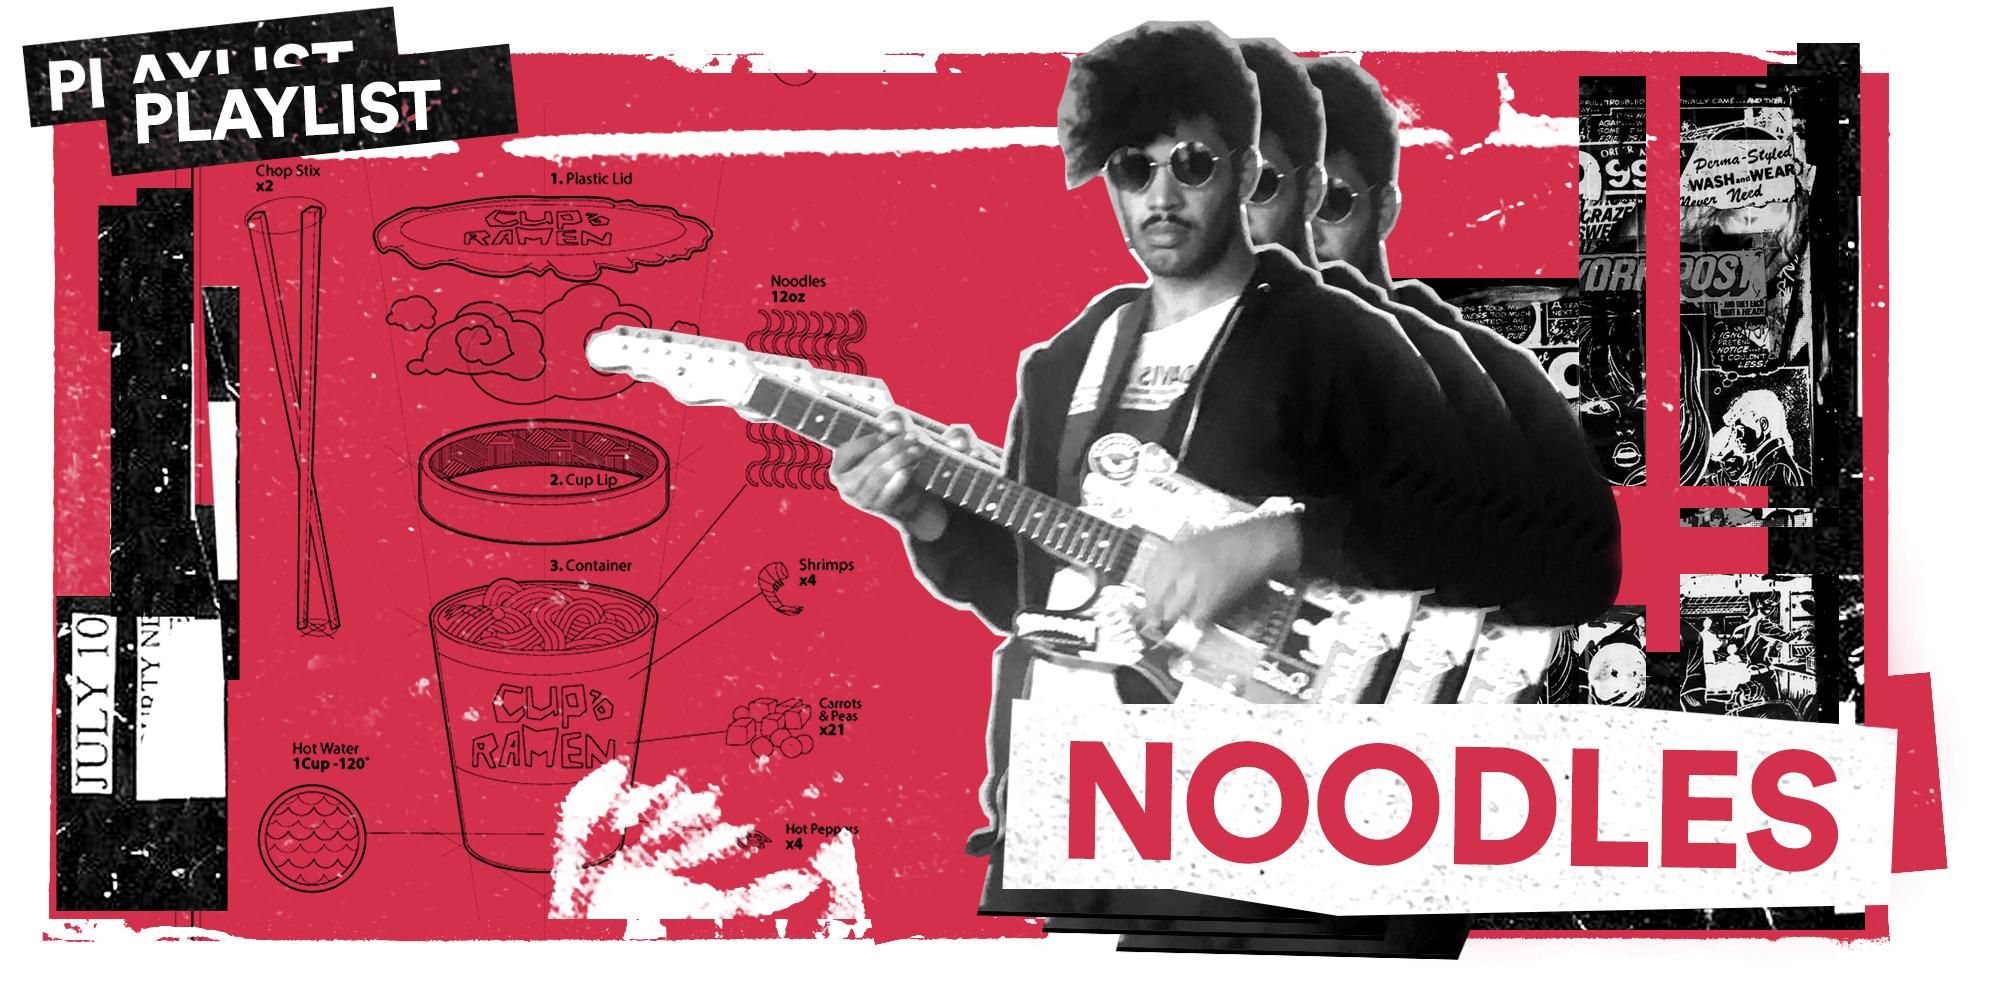 Blog-playlist-noodles.jpg